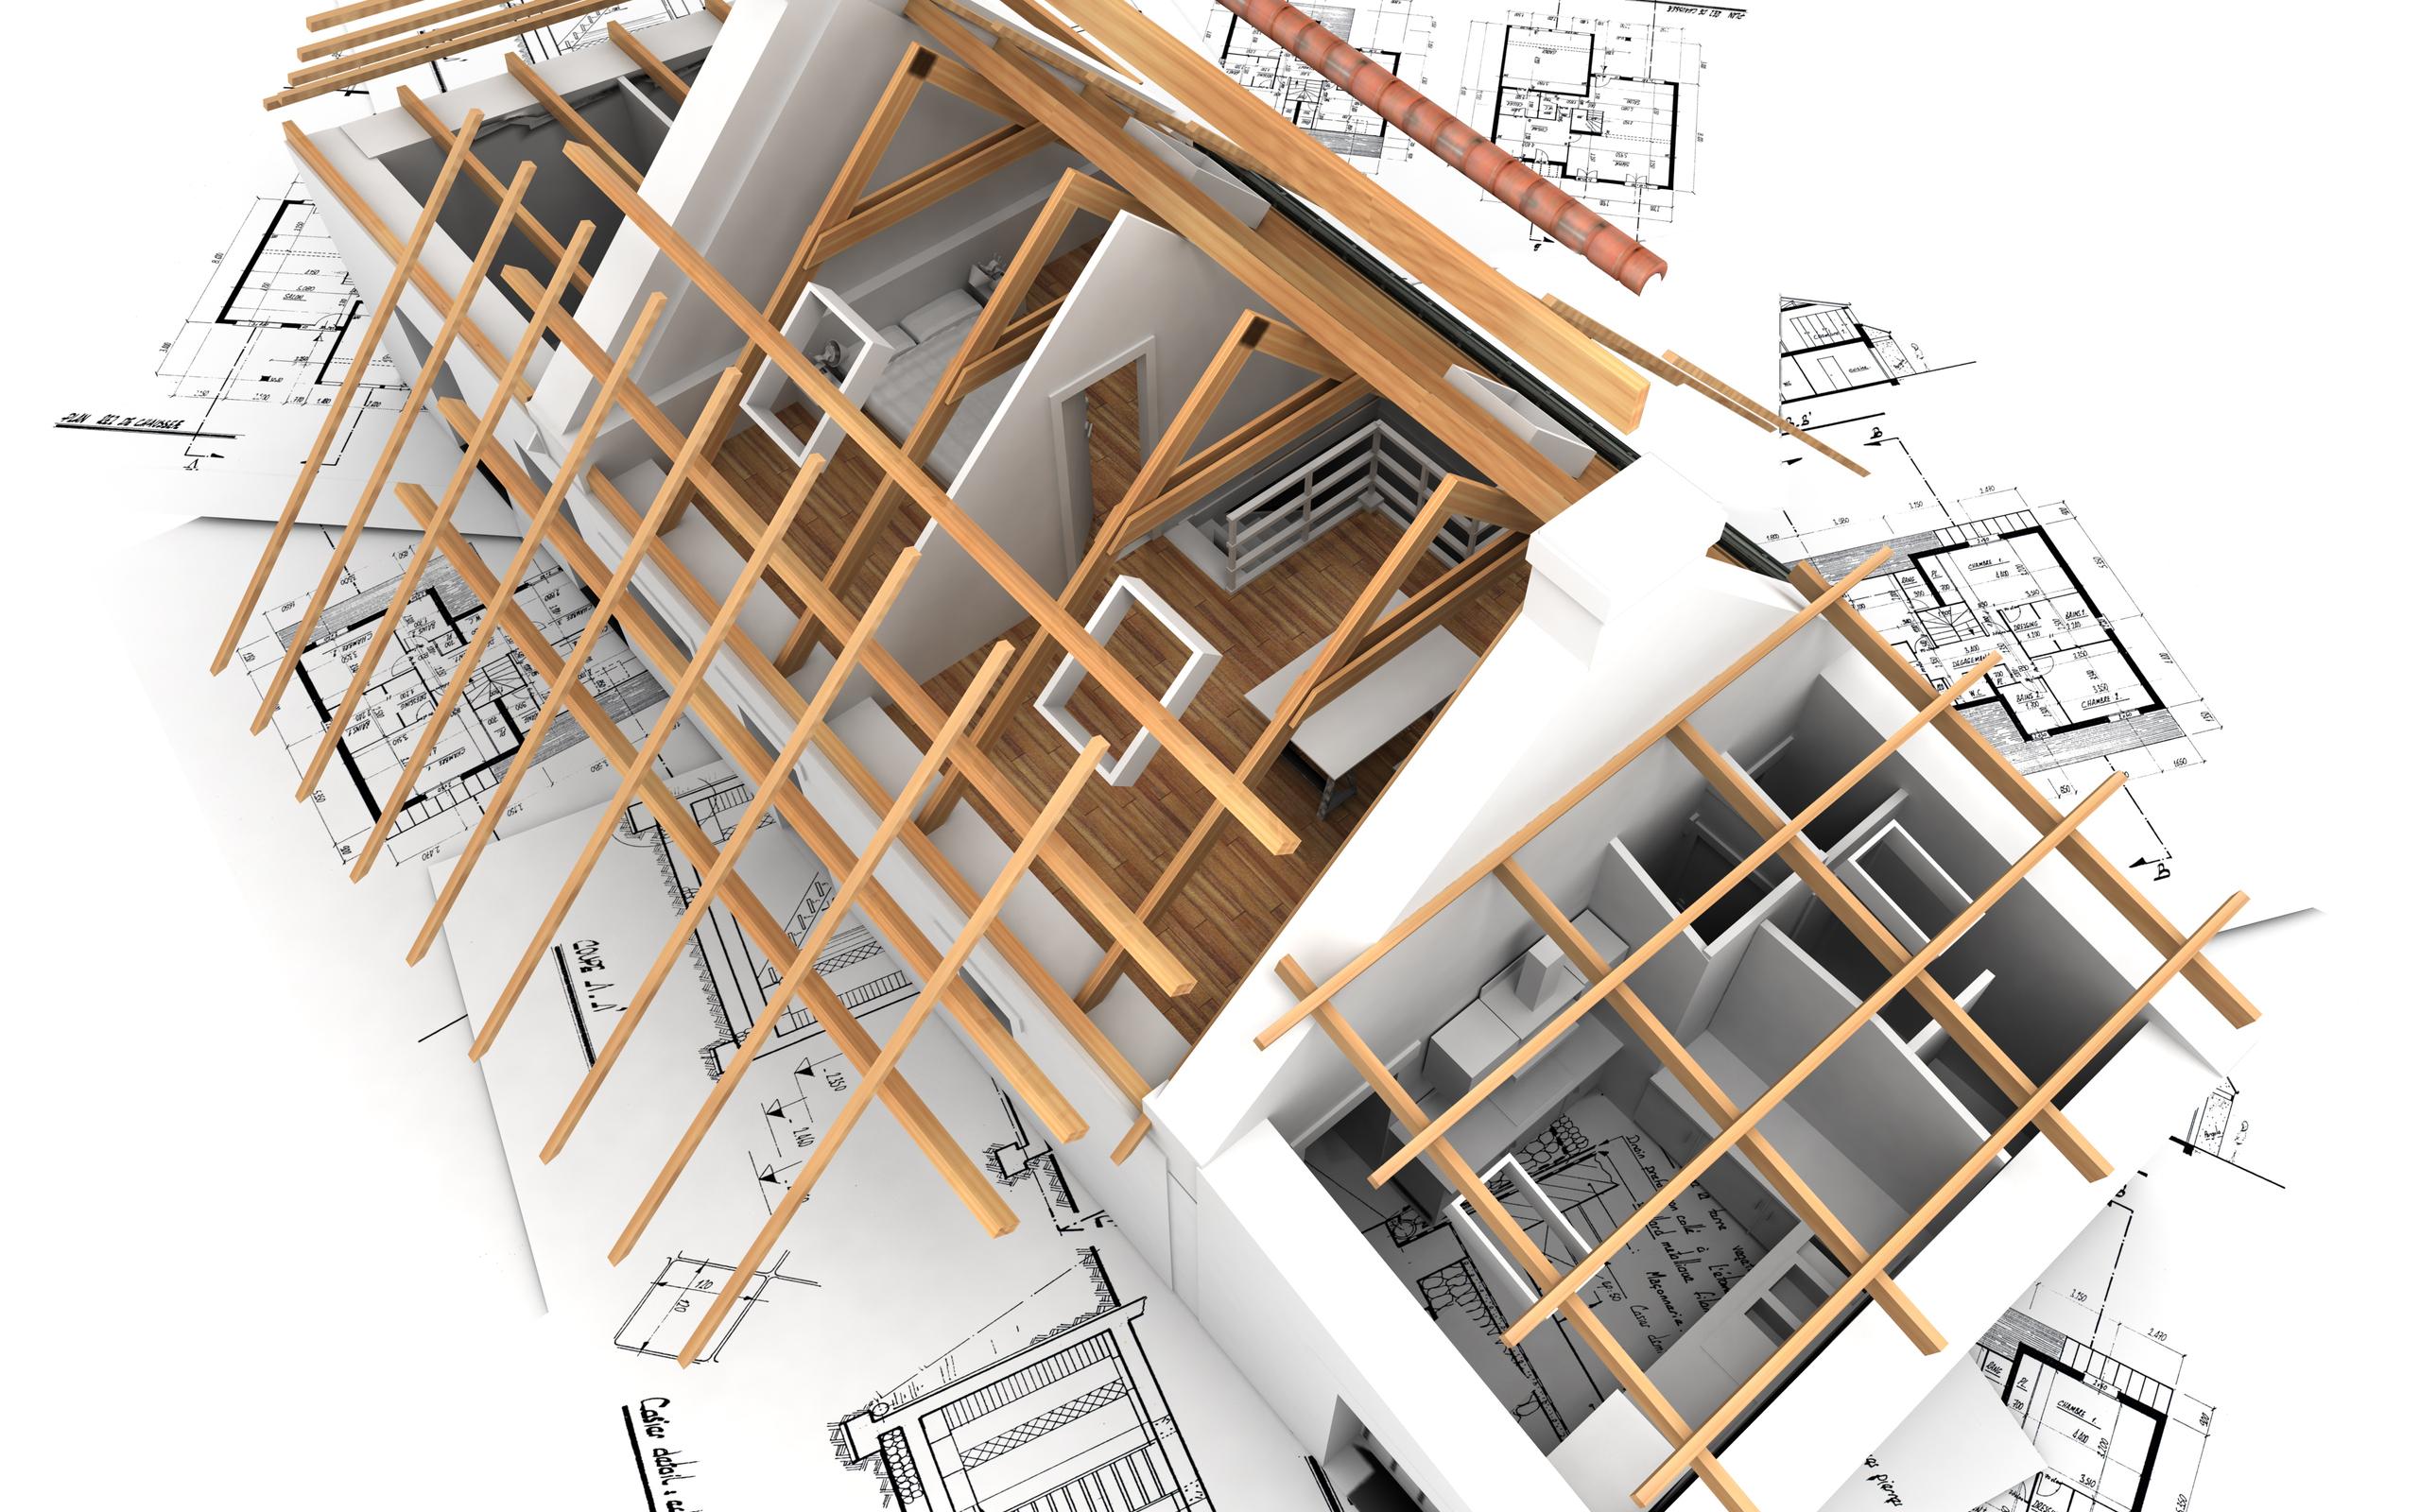 building materials business plan pdf